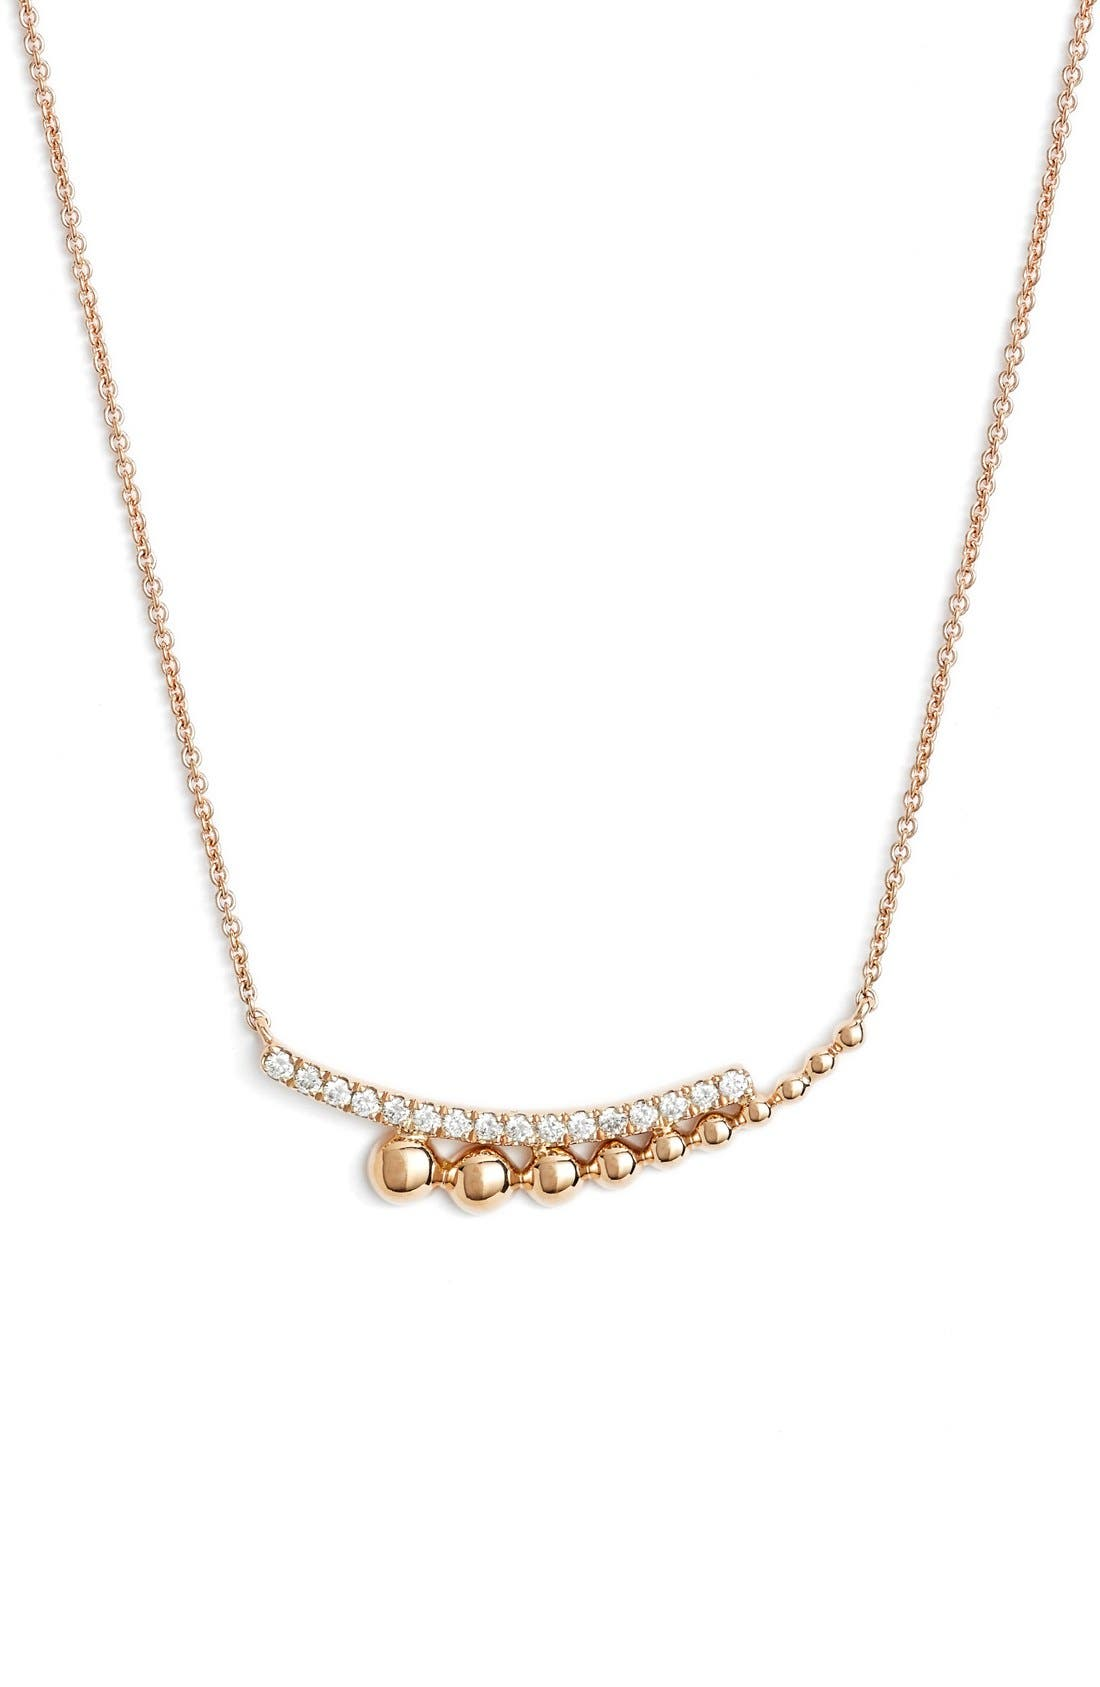 DANA REBECCA DESIGNS Poppy Rae Diamond Pendant Necklace